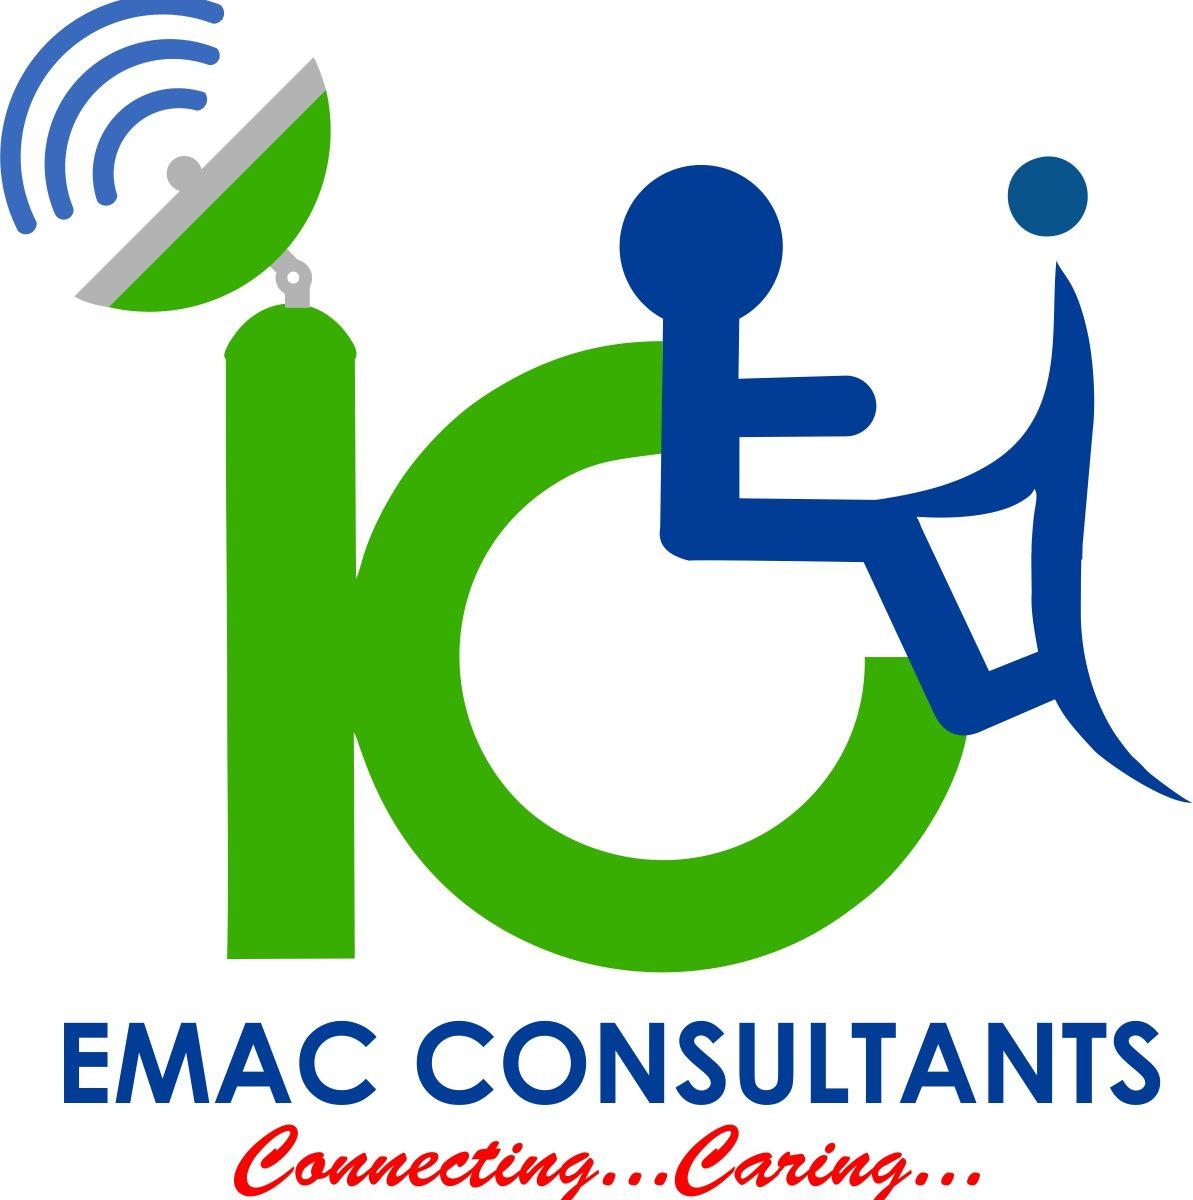 EMAC CONSULTANTS